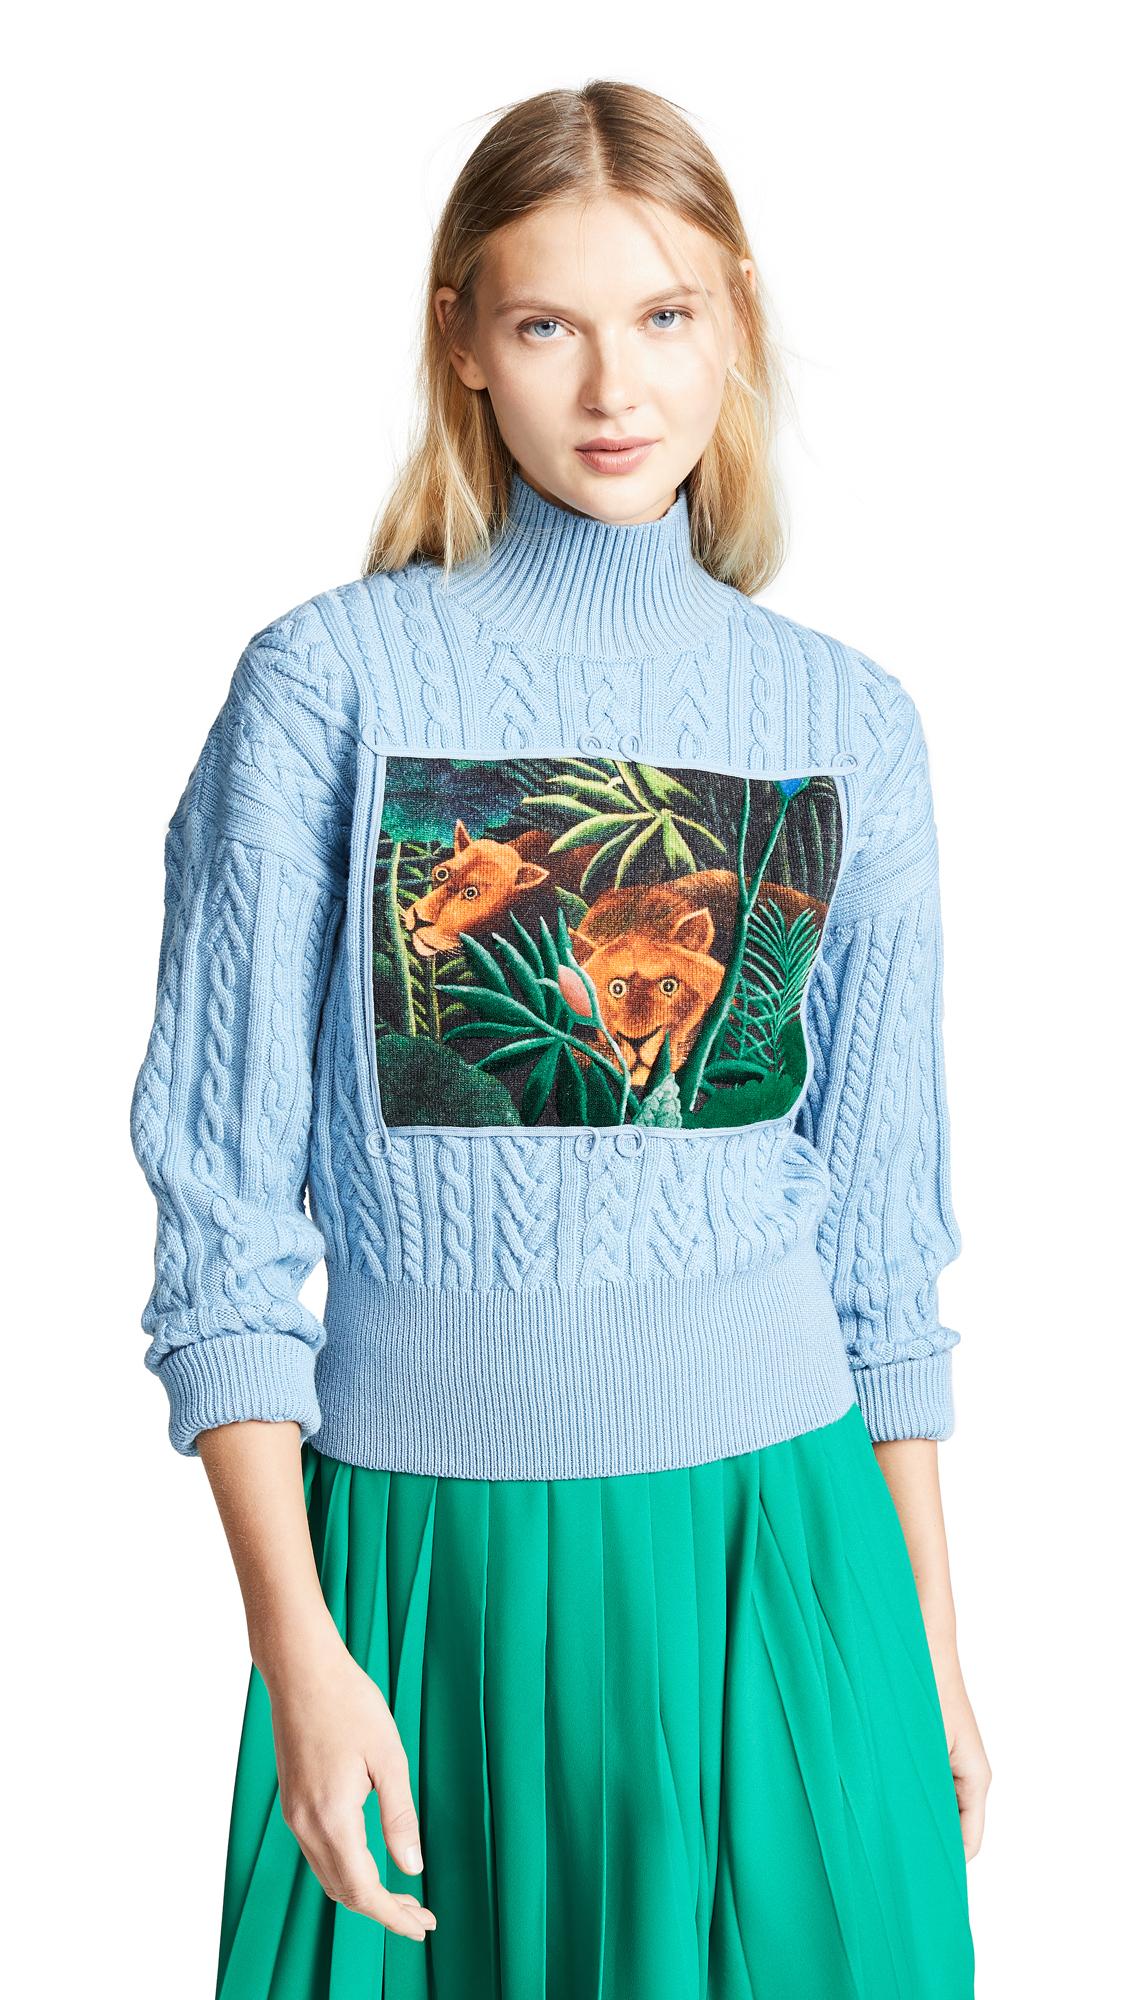 KENZO High Collar Long Sleeve Sweater - Sky Blue